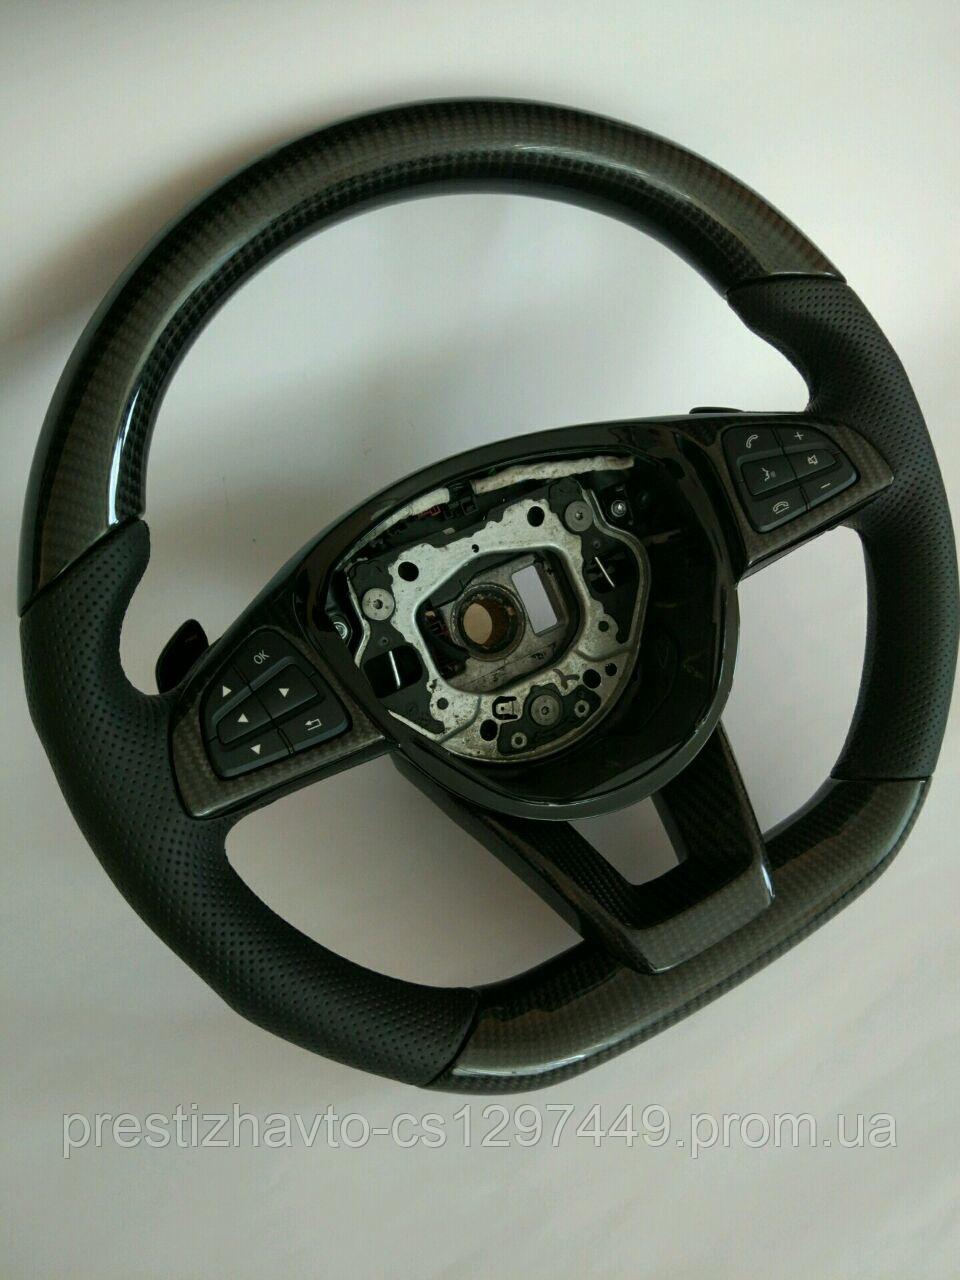 Руль карбоновый AMG на Mercedes S-Class W222